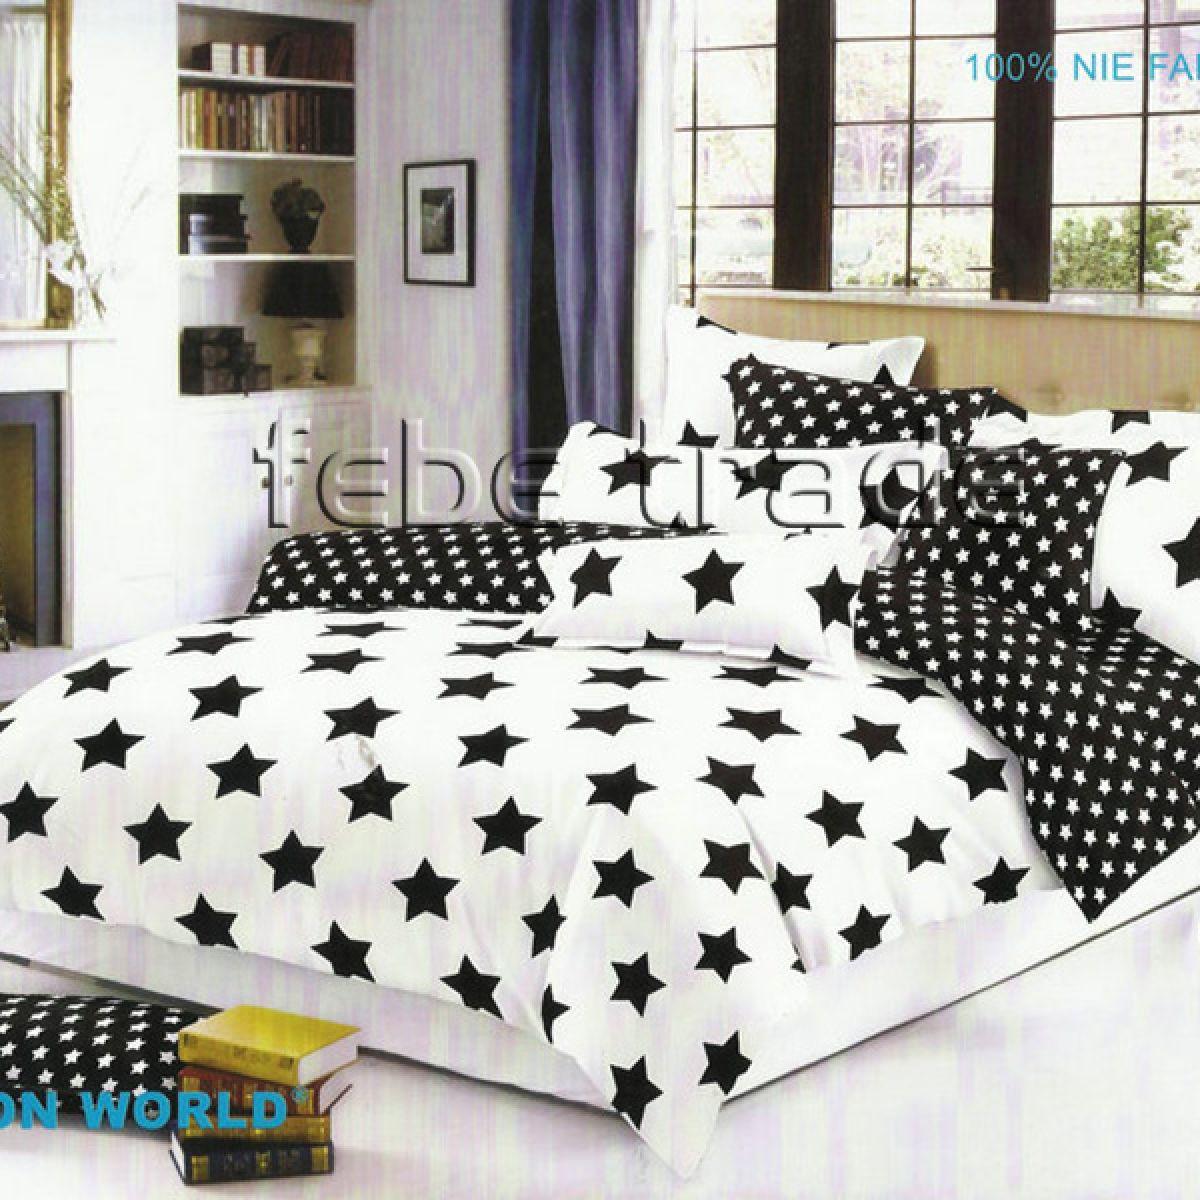 Double-sided Beddings - TZ-315 - 160x200 cm - 4 pcs